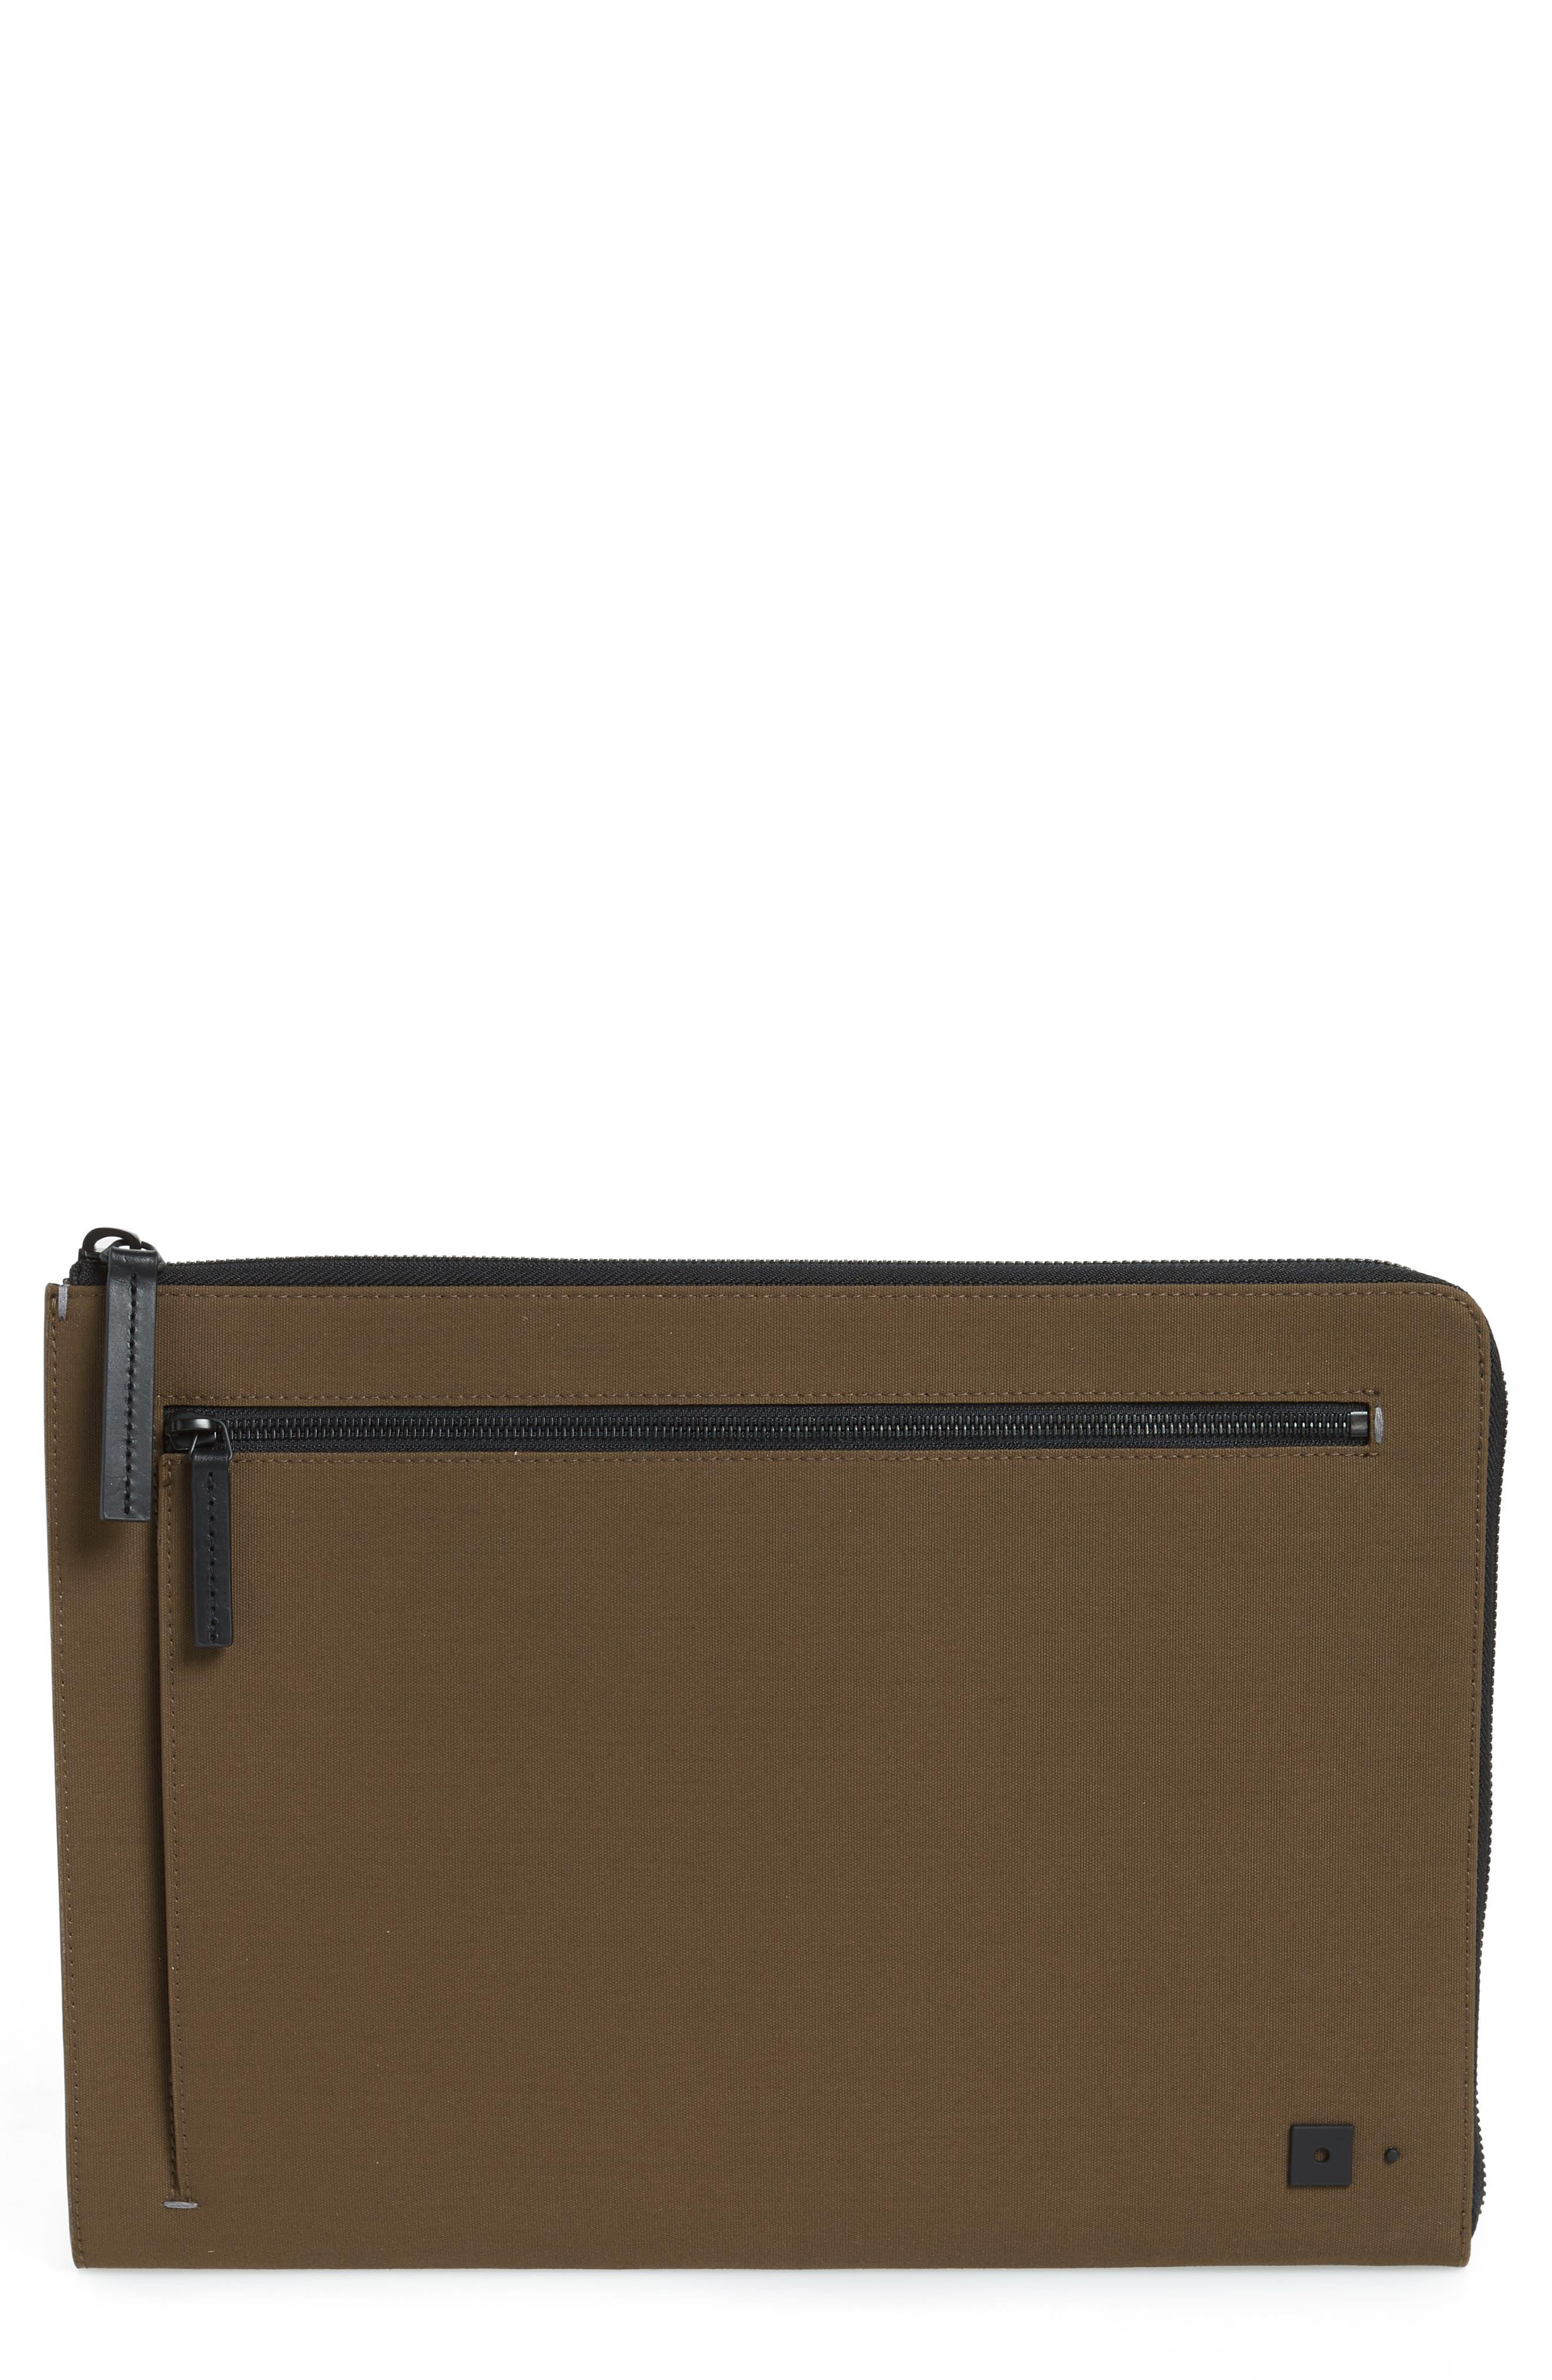 Portfolio Case,                             Main thumbnail 1, color,                             Khaki Canvas/ Black Leather